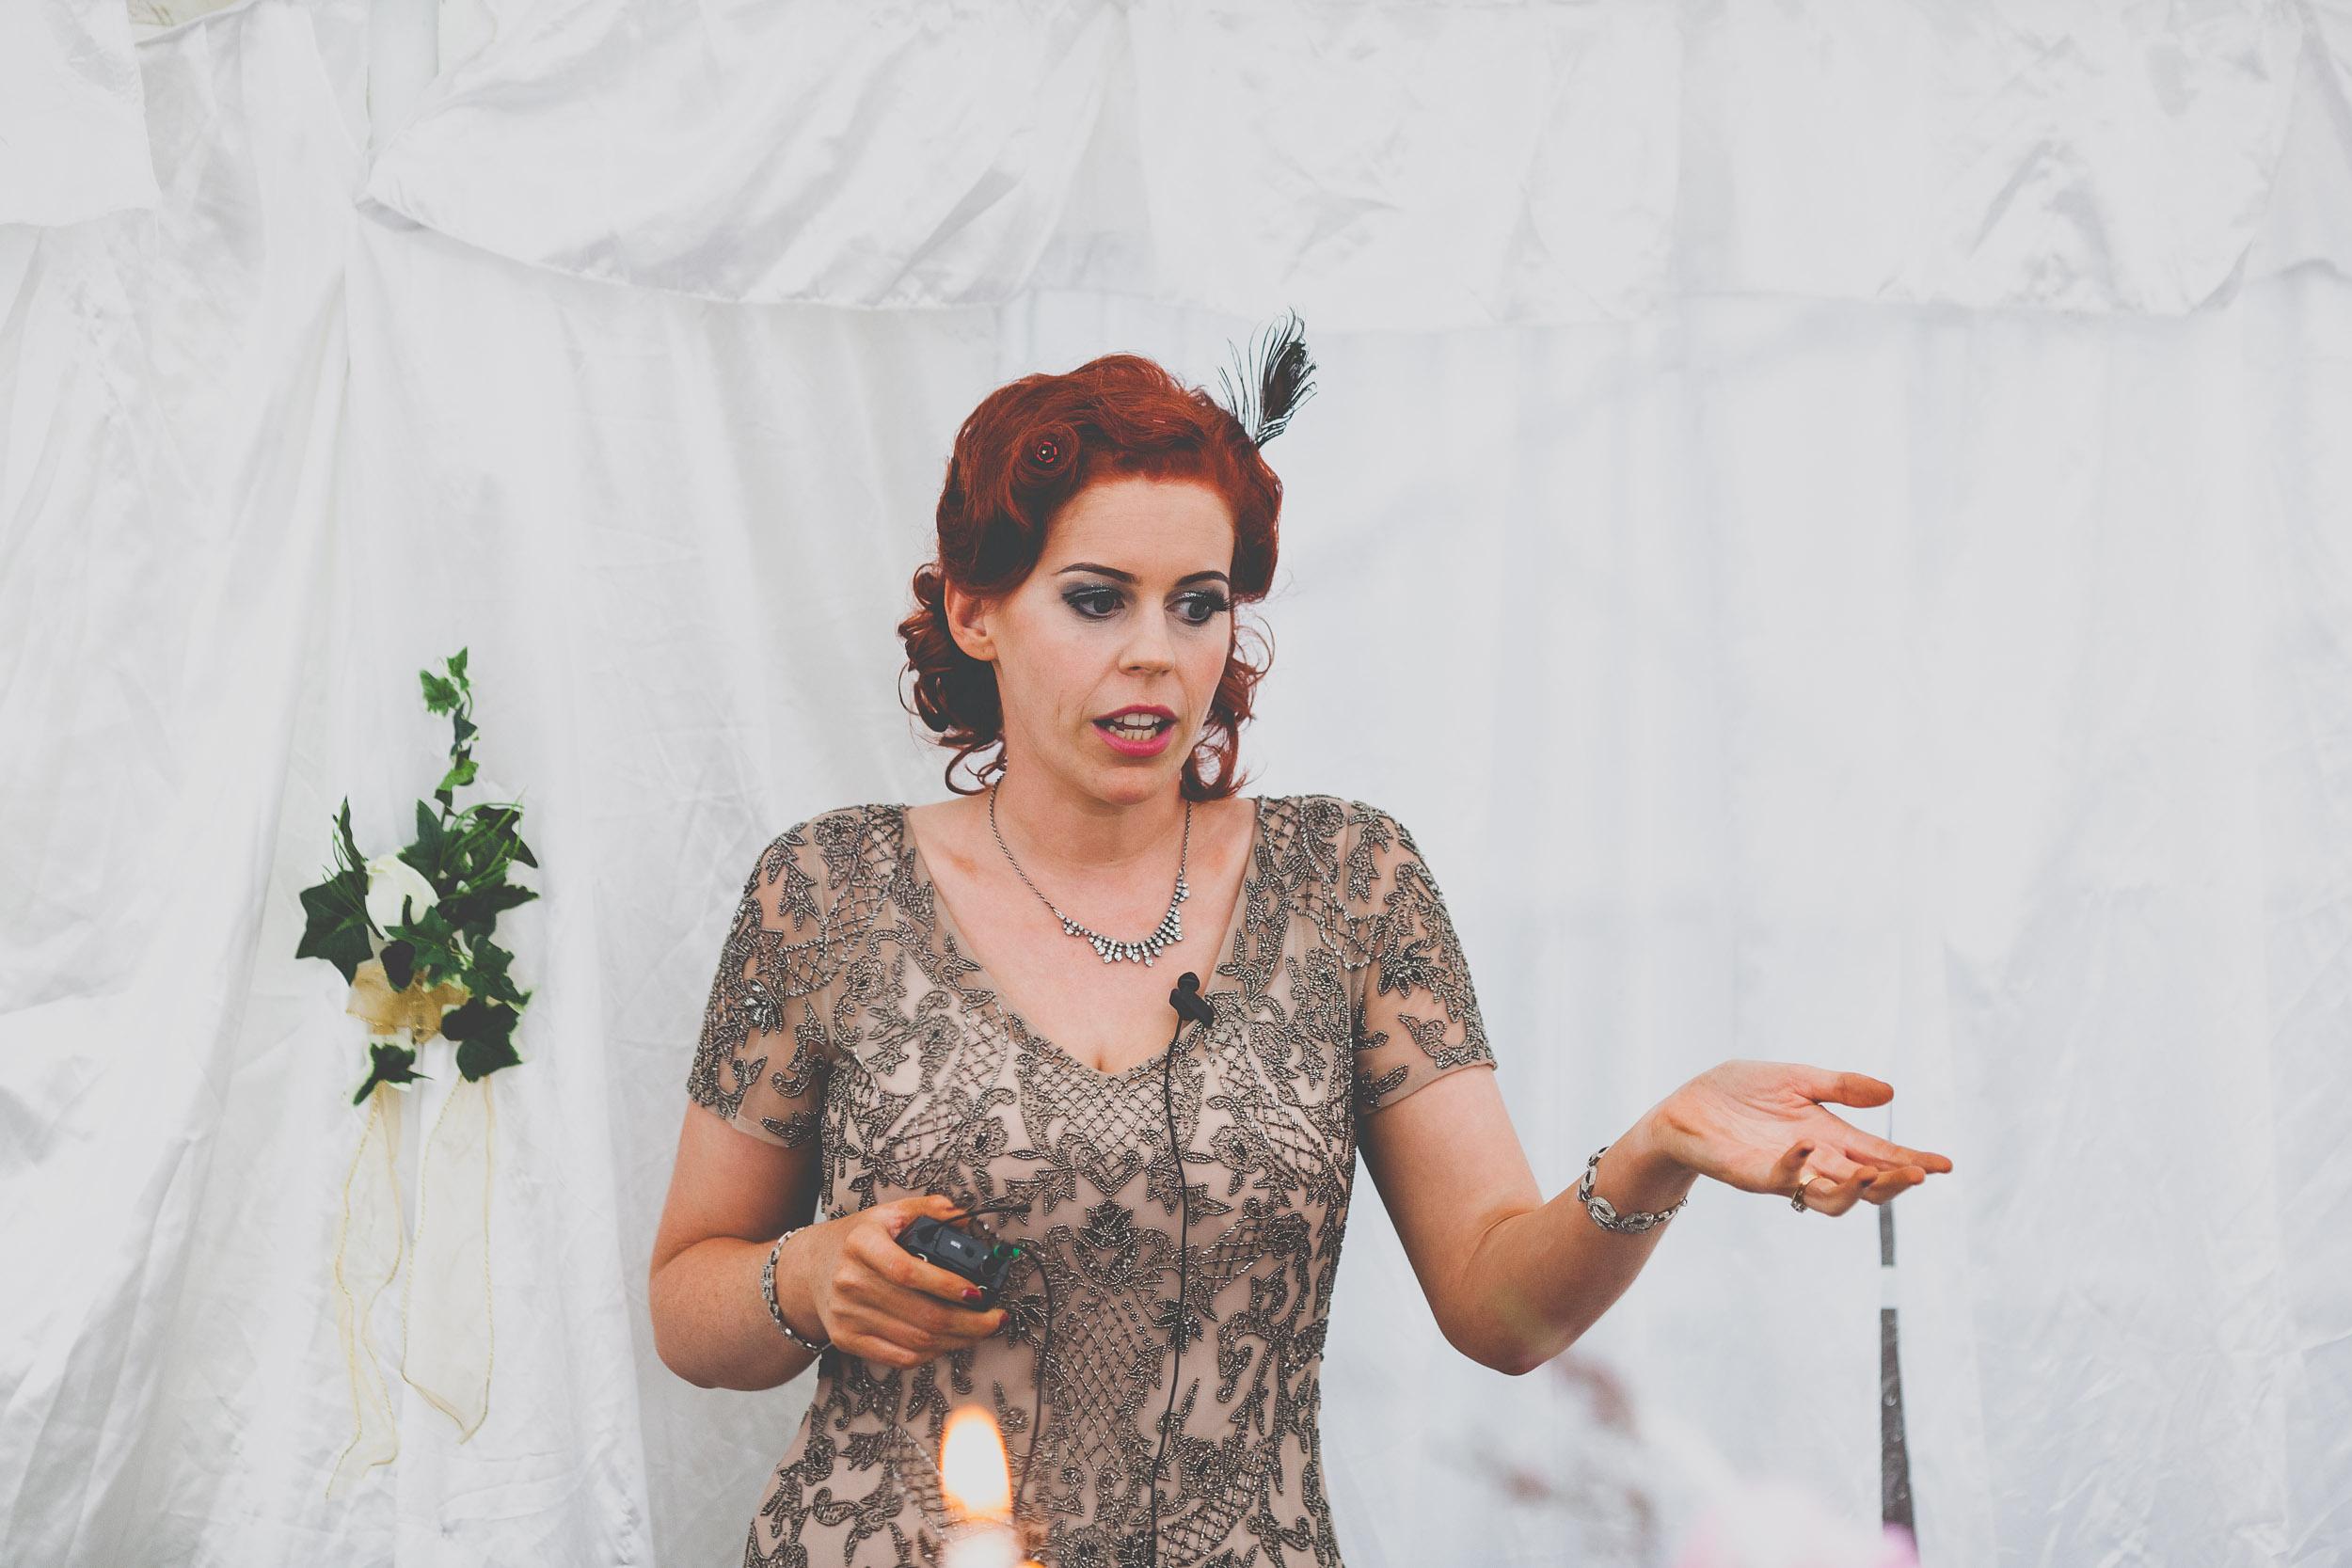 queen-elizabeths-hunting-lodge-epping-forest-wedding352.jpg